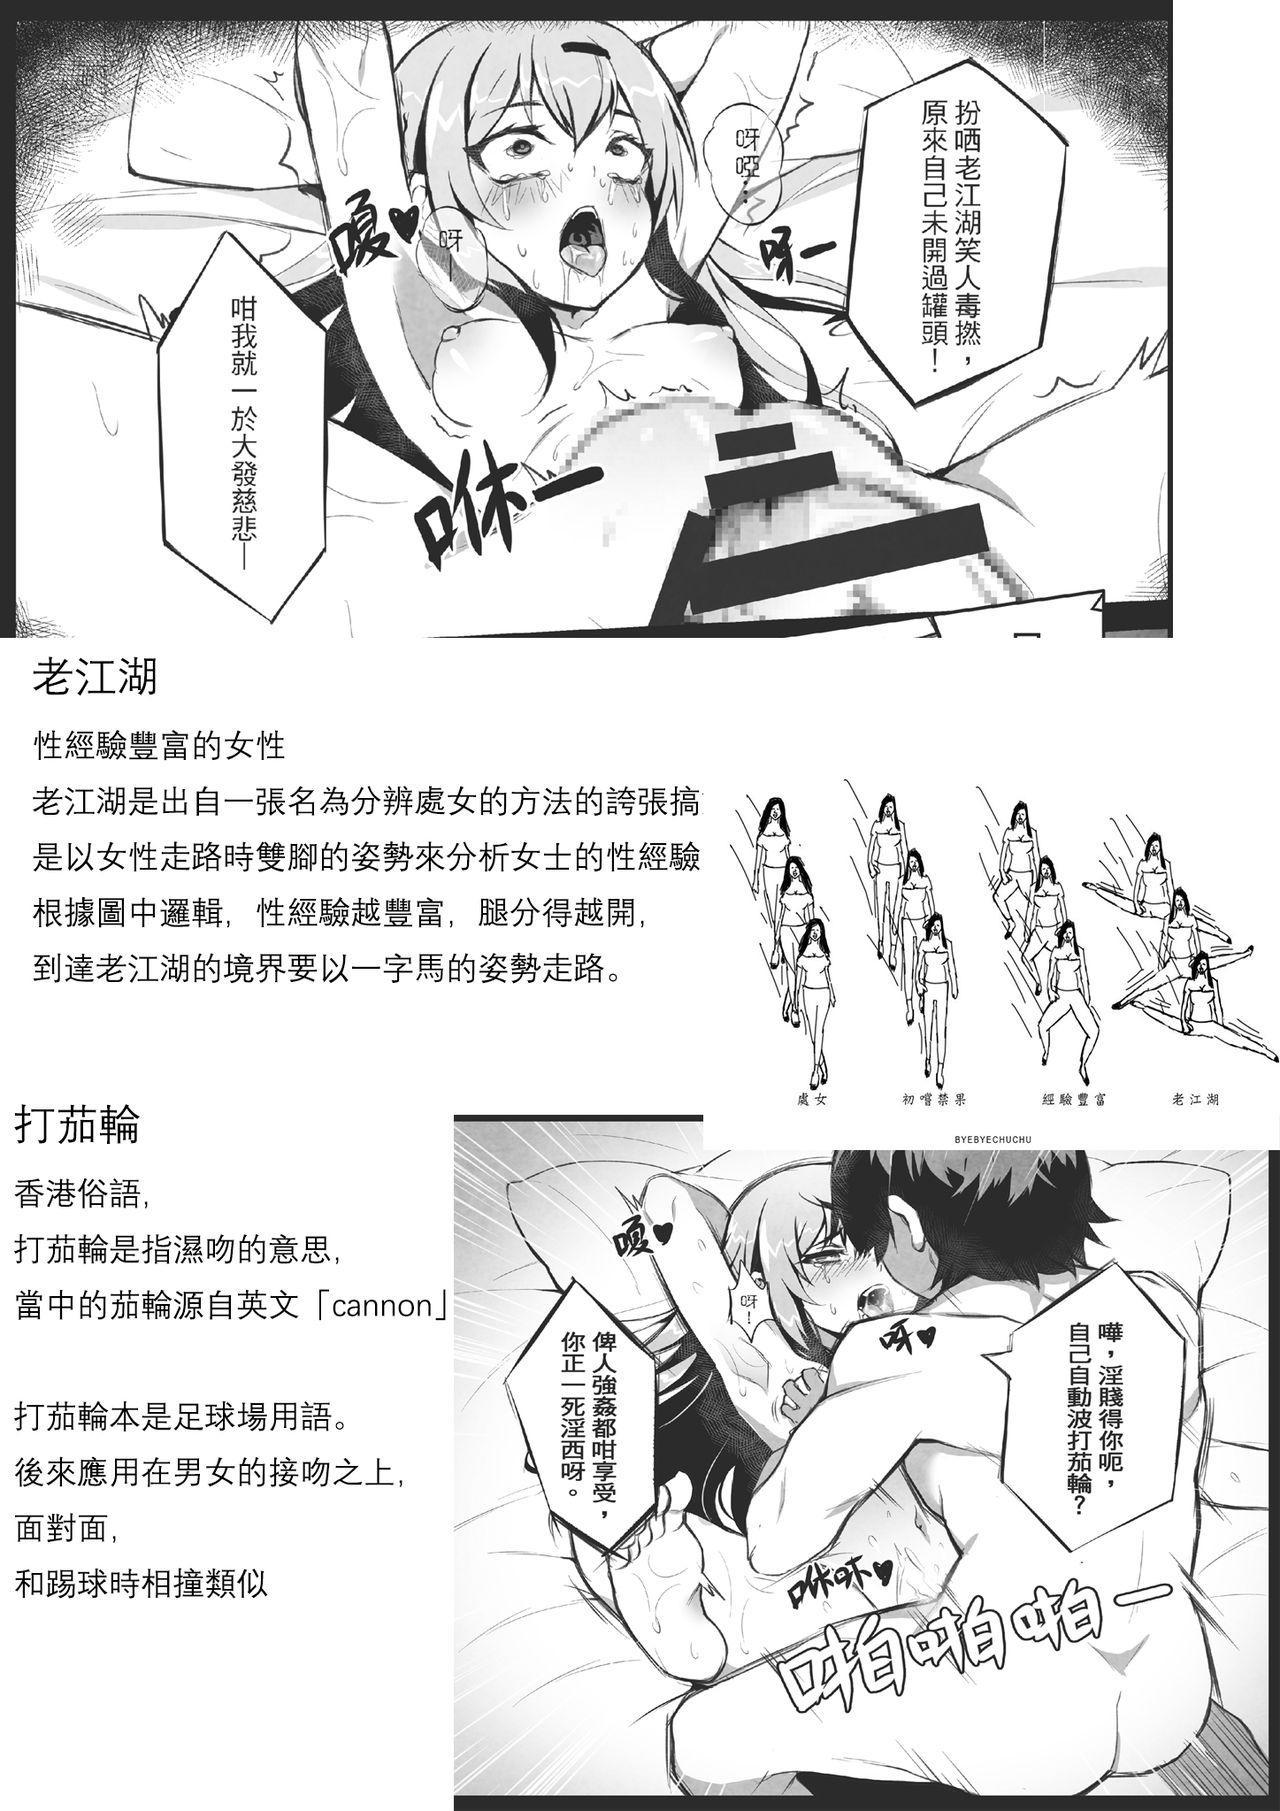 [Gantou Ikunoro] MK girl embodies the spirit of Hong Kong under the Lion Rock [Chinese]  [君廣東話本當上手機翻漢化組] v2 35